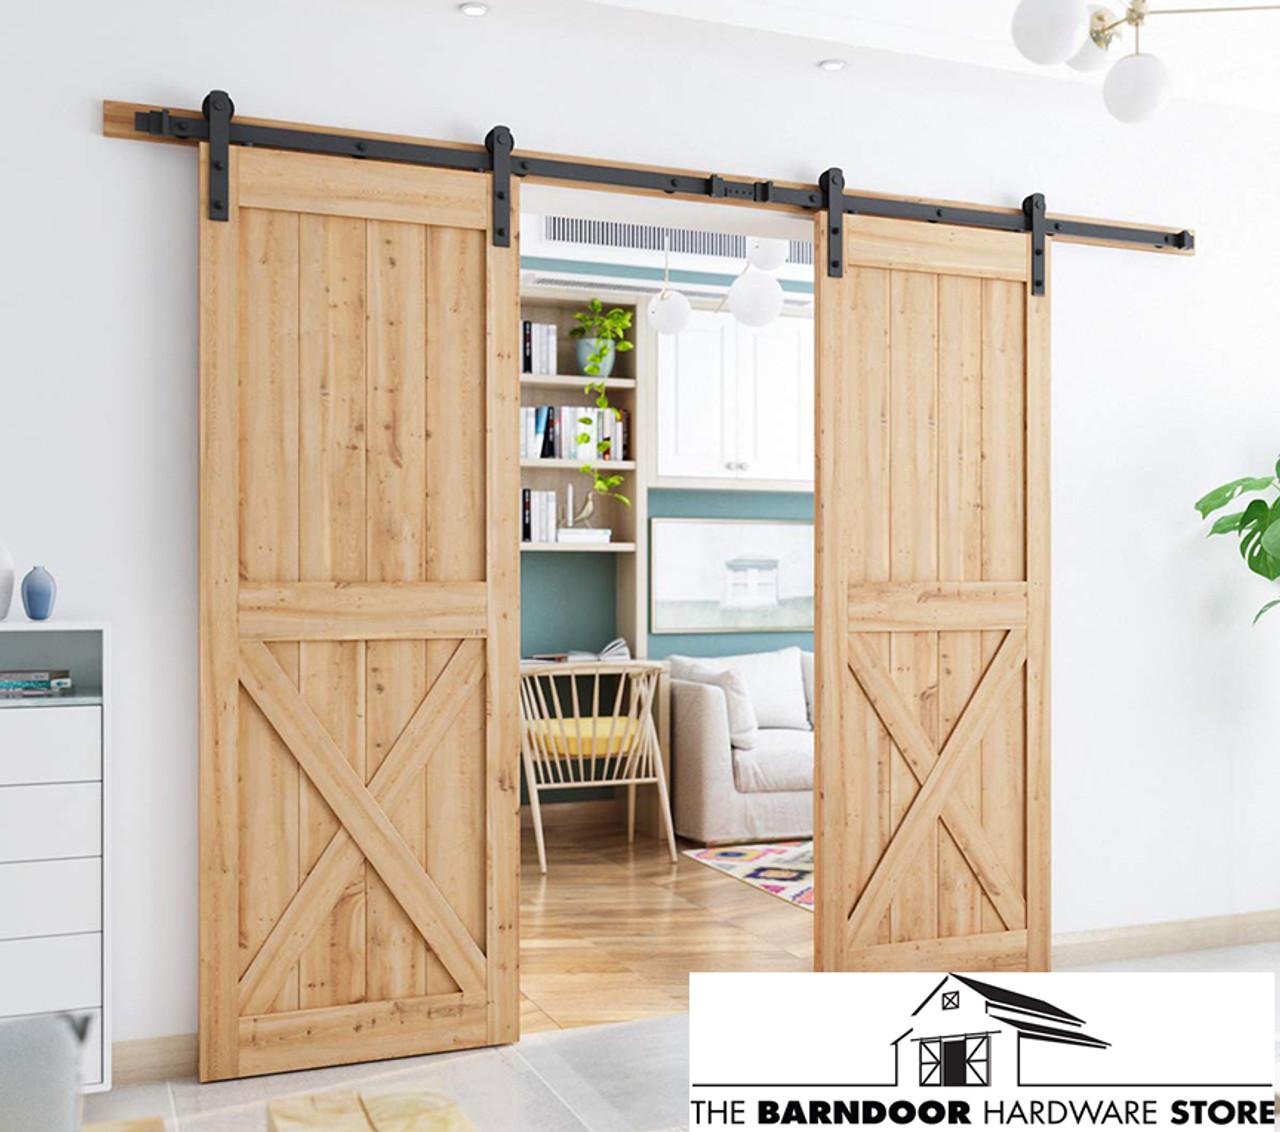 Double Sliding Barn Door Hardware Kit The Barn Door Hardware Store